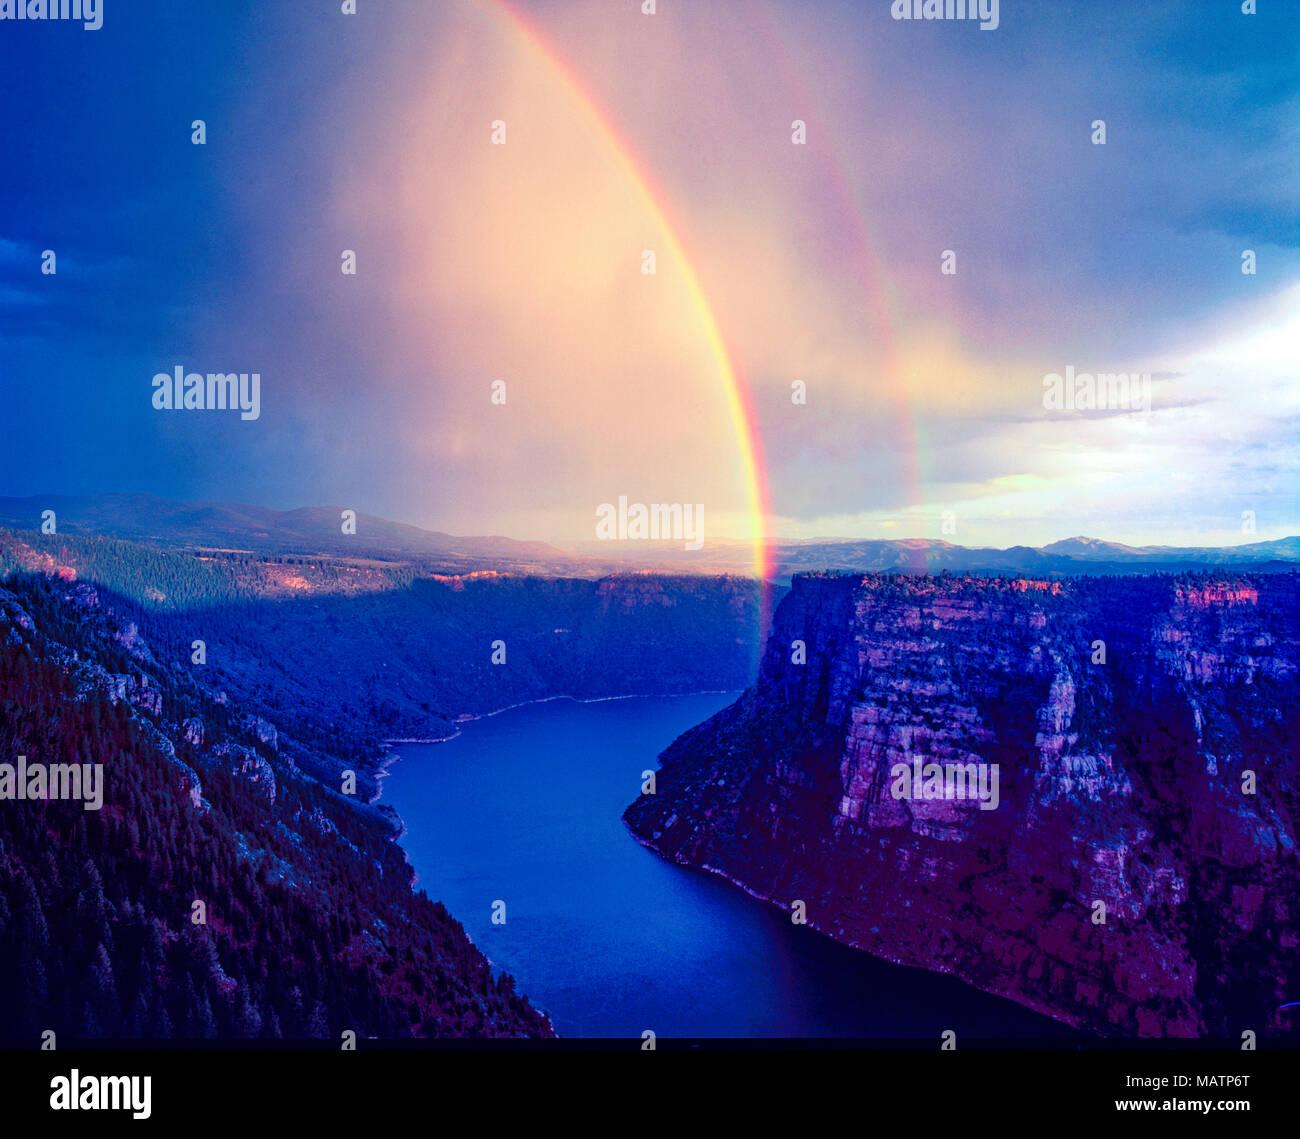 Rainbow su Flaming Gorge, Flaming Gorge National Recreation Area, Utah acnyon rosso si affacciano, UInta Mountains Foto Stock